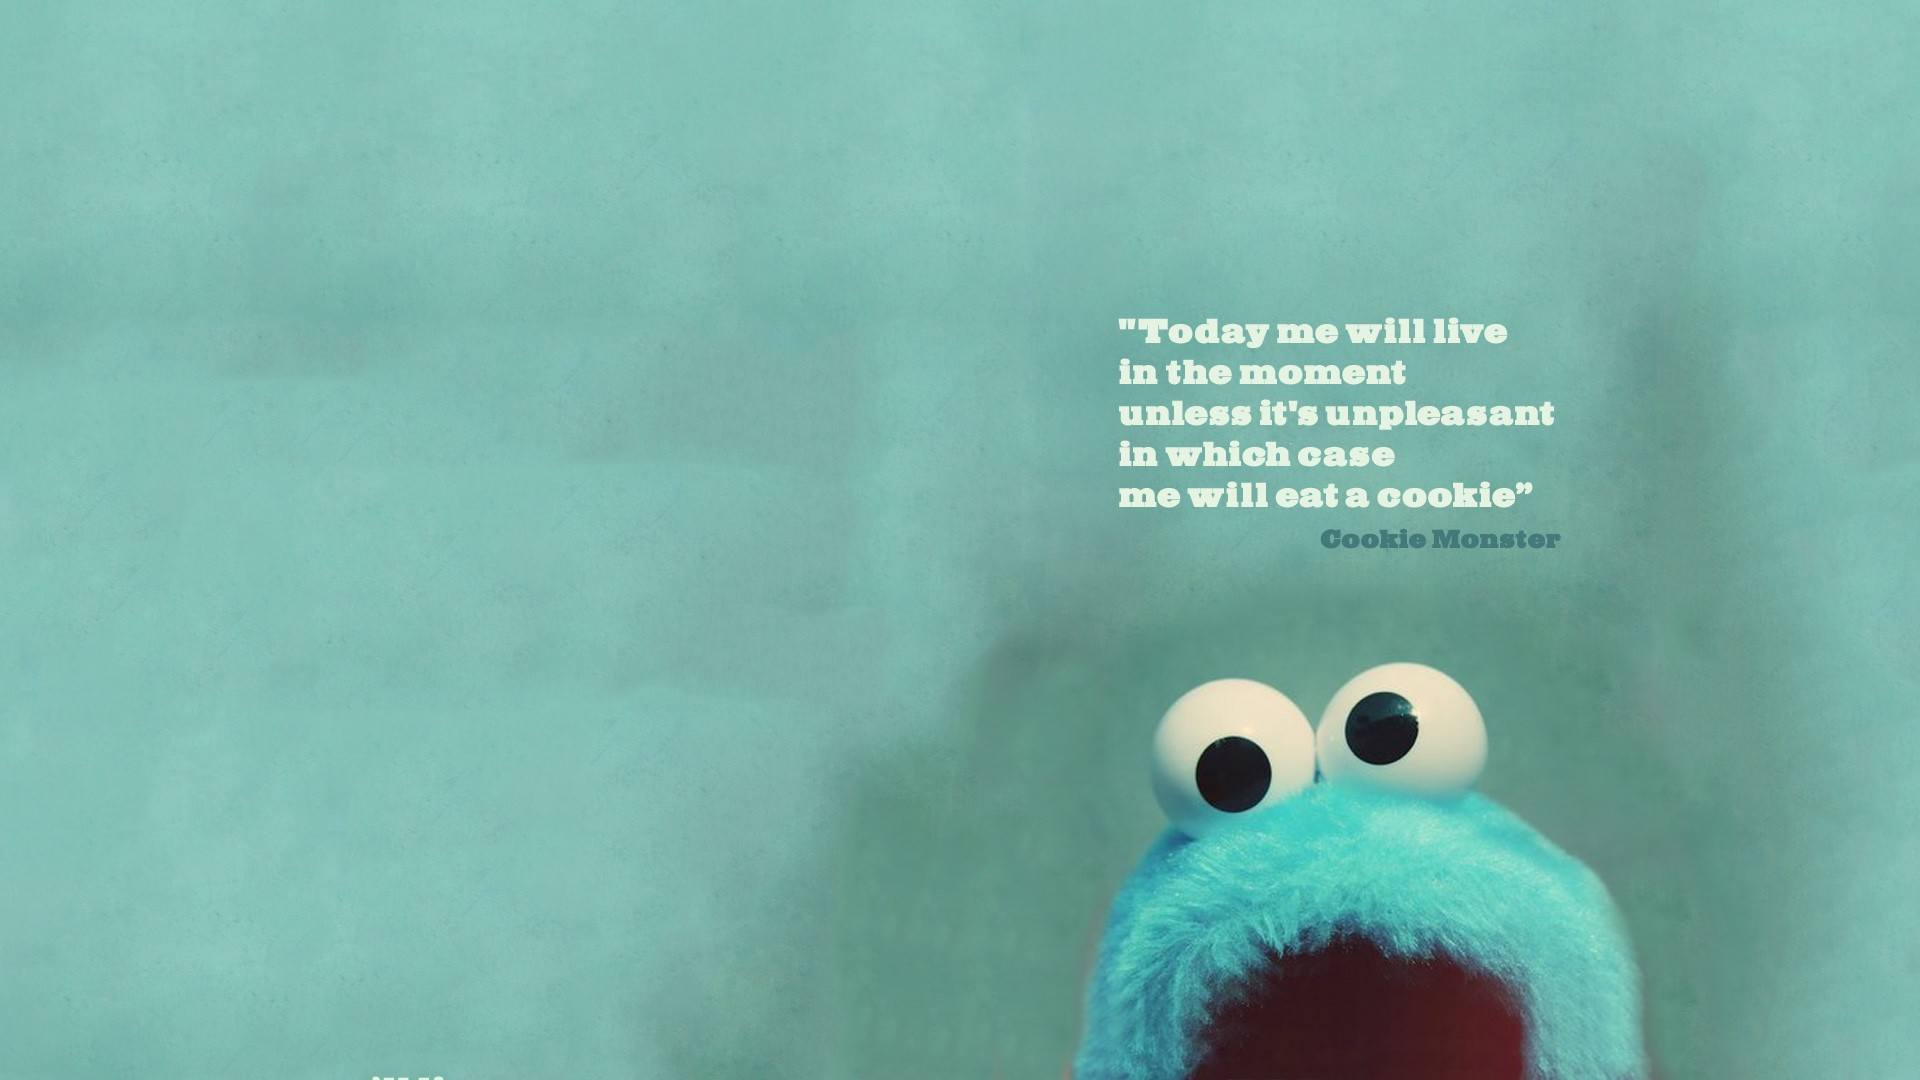 Cookie Monster Green Live Cookie wallpaper 1920x1080 117602